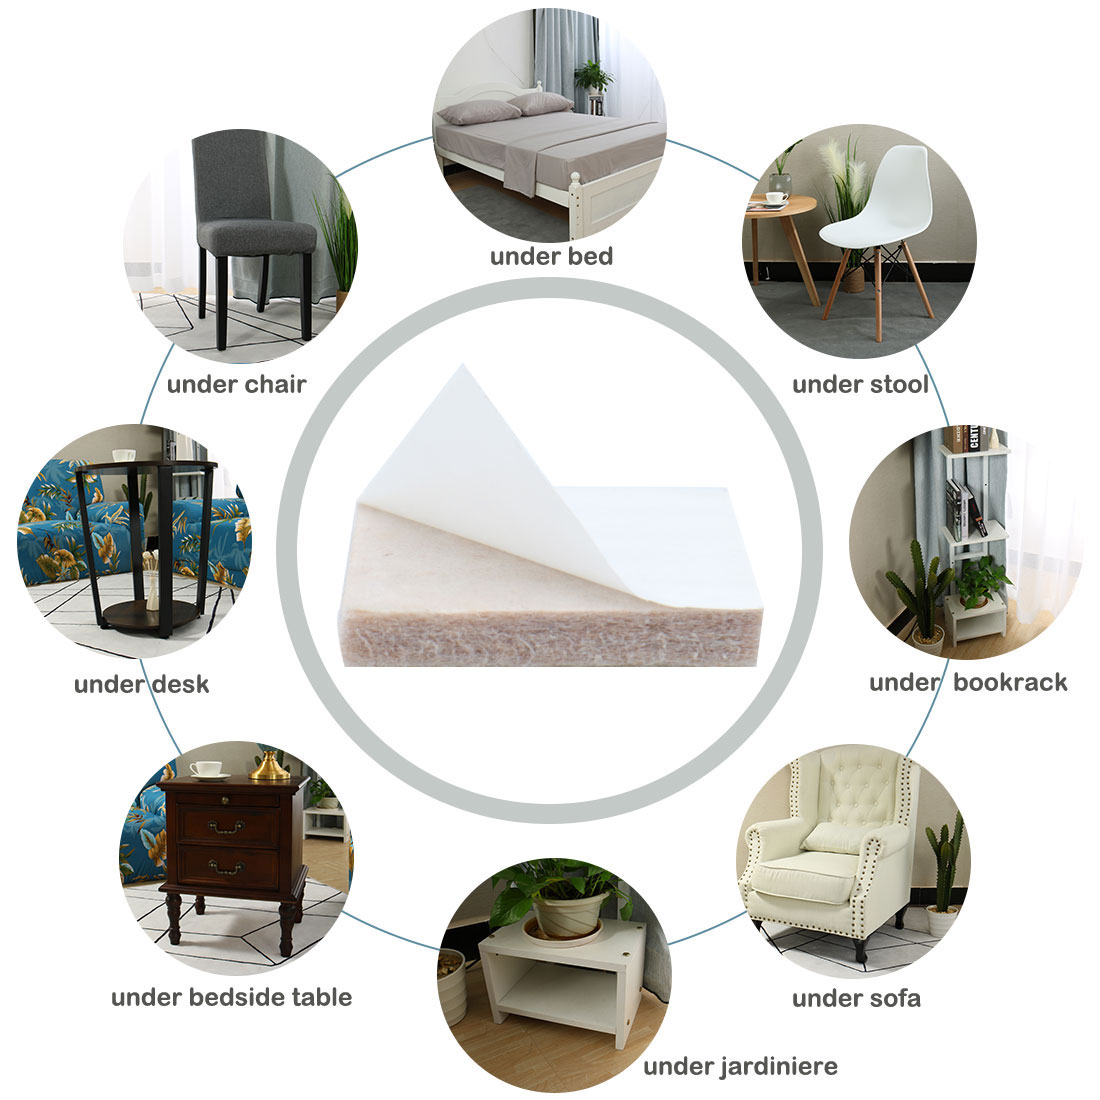 "Furniture Pads Square 1 5/8"" Self-stick for Furniture Floor Protector 12pcs - image 2 de 7"